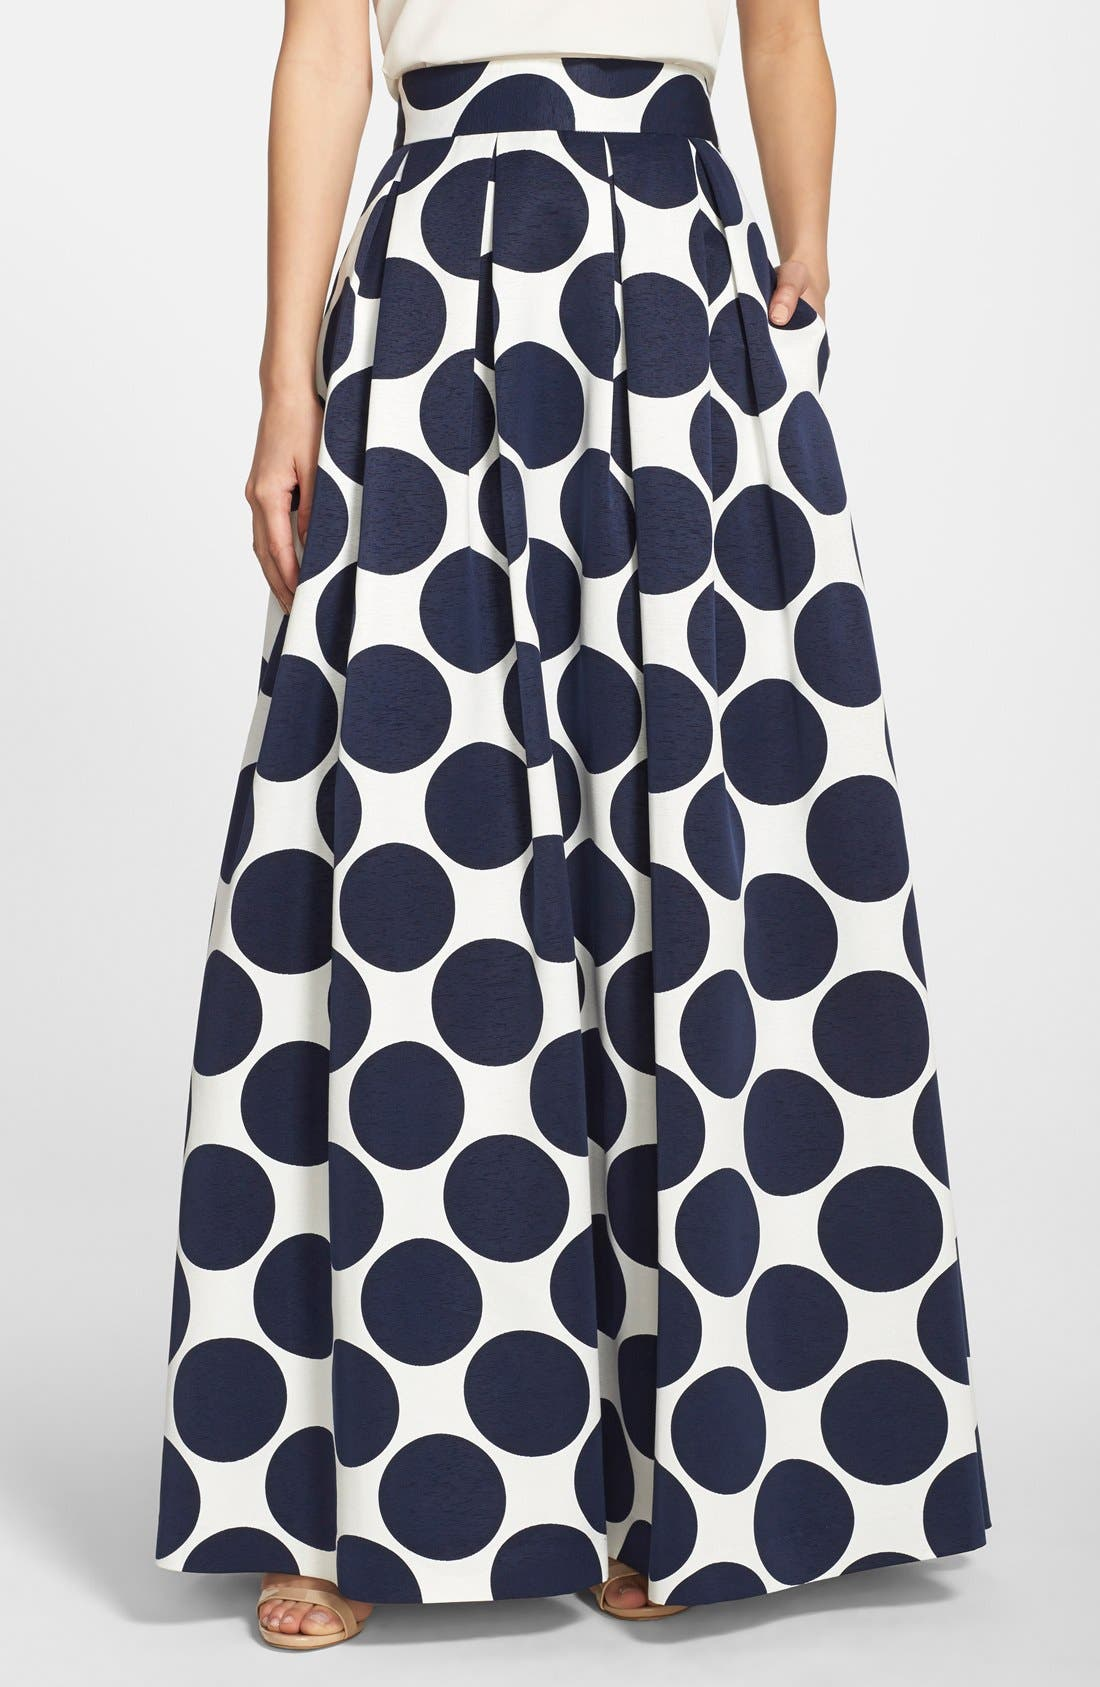 Pleated Dot Print Ball Skirt,                         Main,                         color, Navy/ Ivory